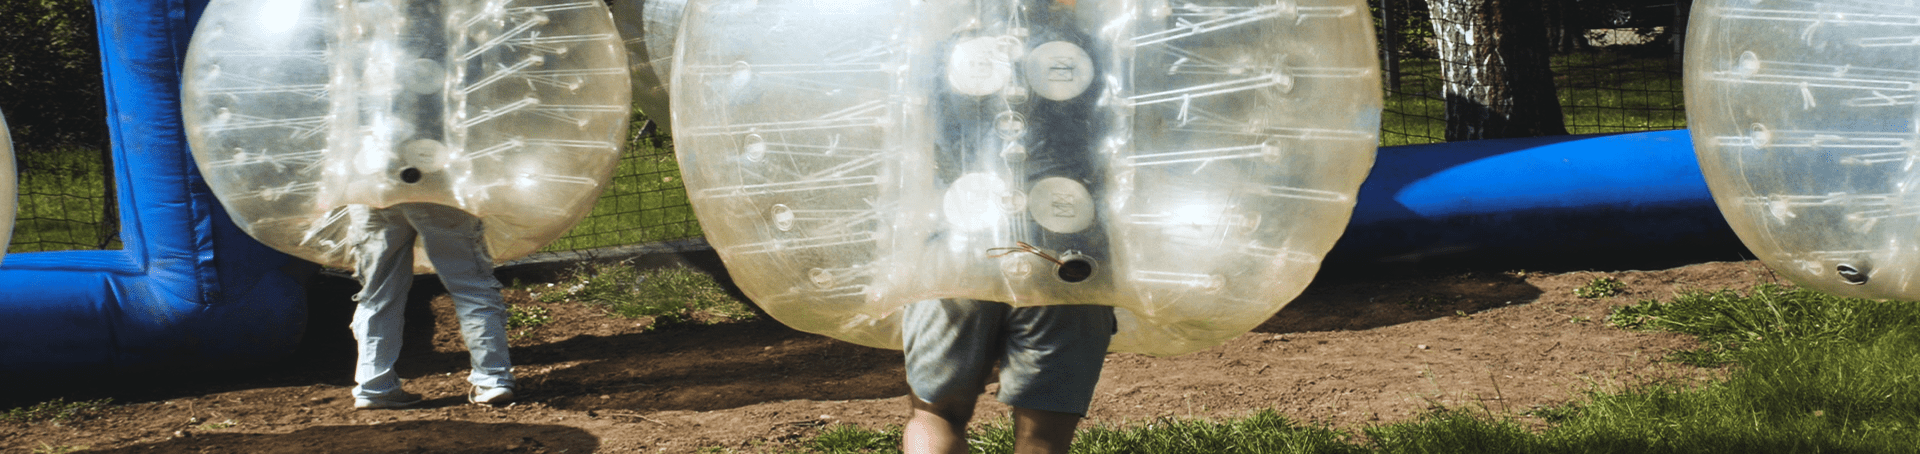 Bubbleball in der Basis51